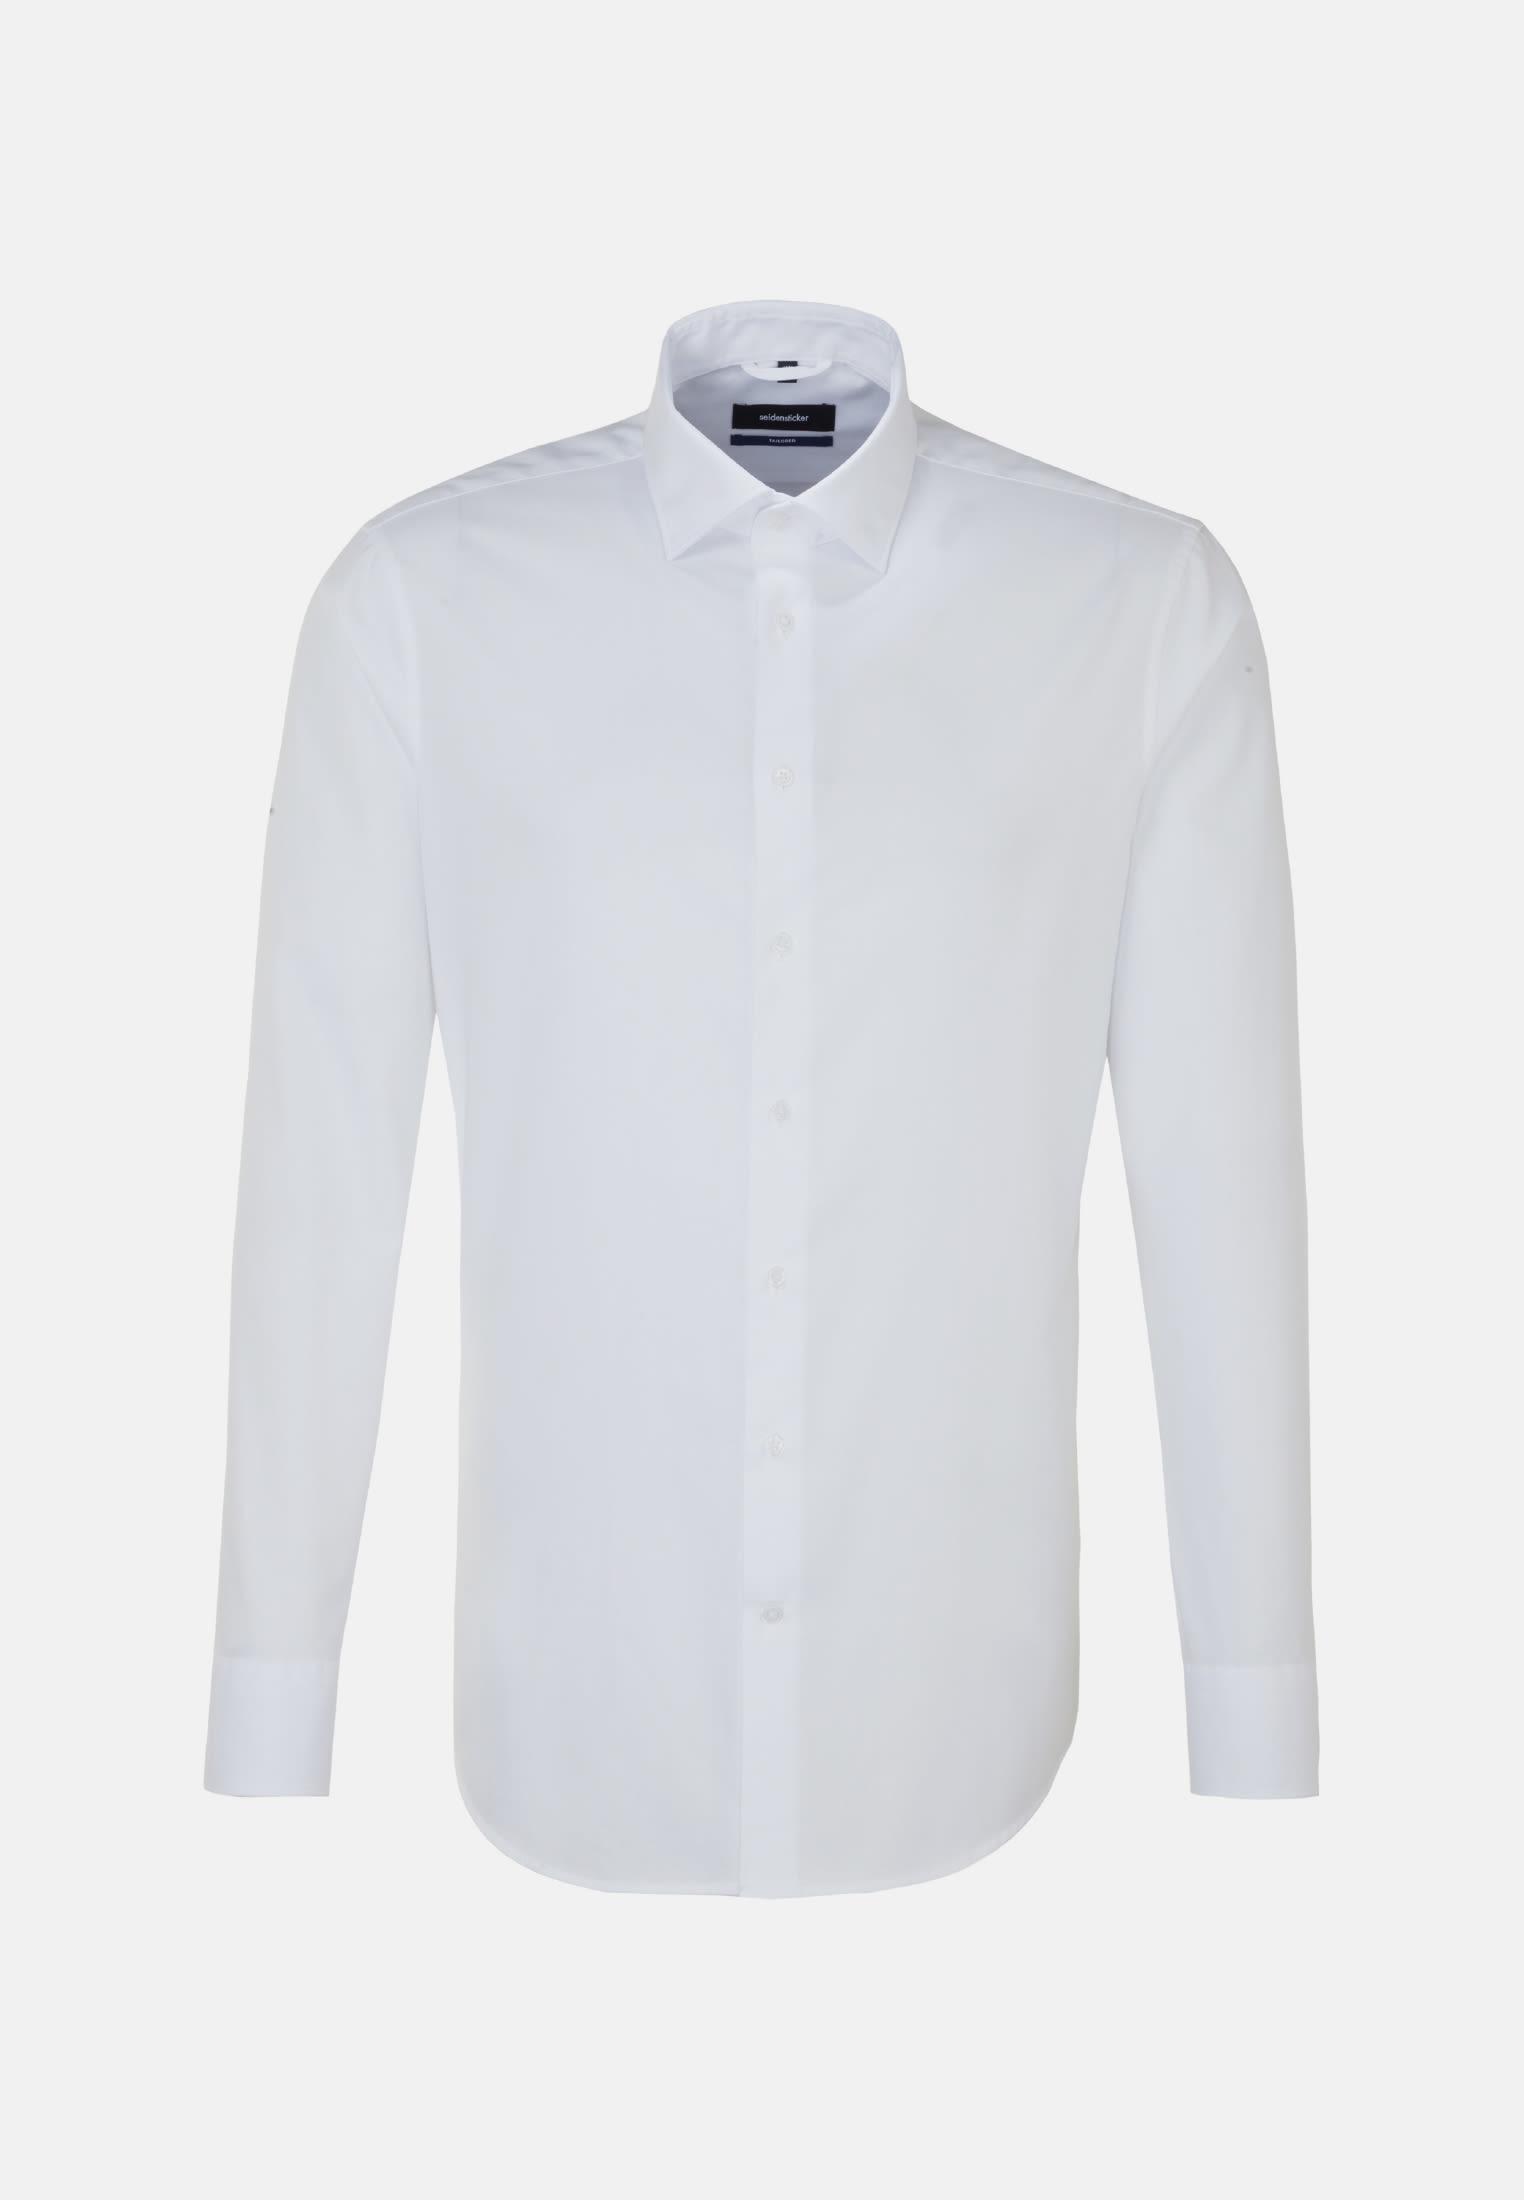 Easy-iron Twill Business Shirt in Tailored with Kent-Collar in weiß |  Seidensticker Onlineshop